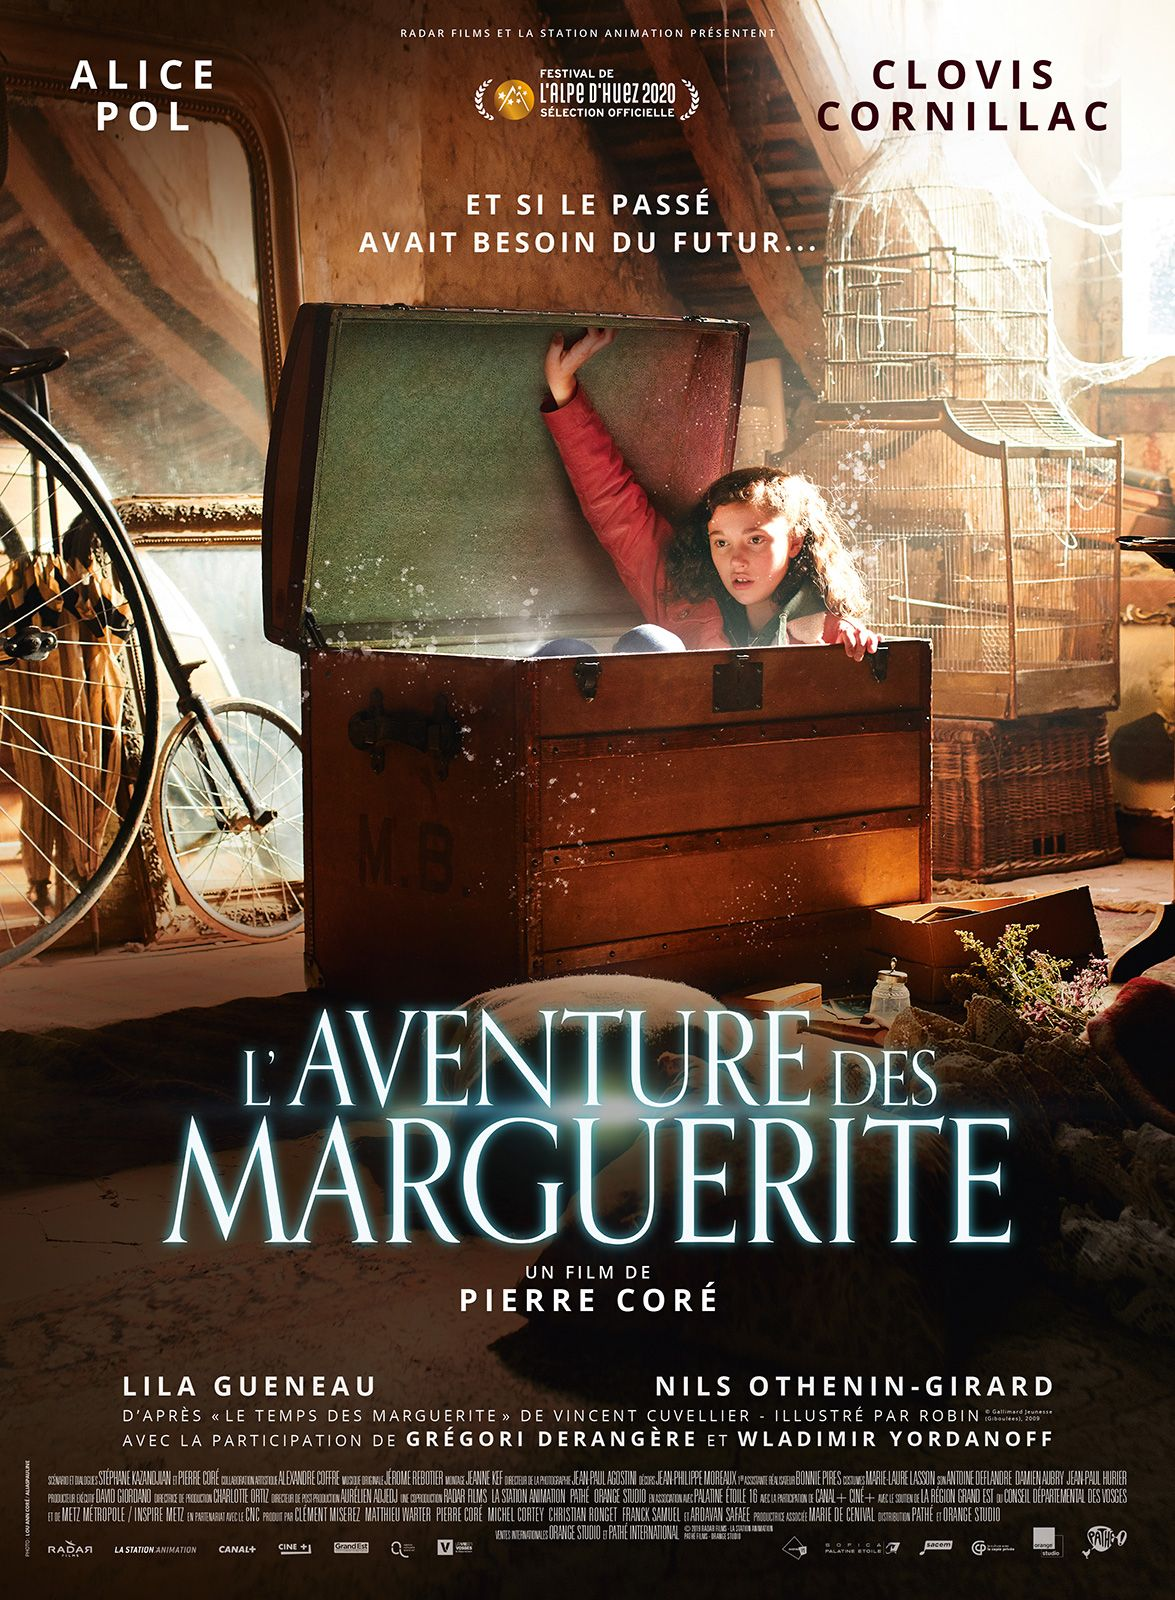 L Aventure Des Marguerite Streaming Vf 2020 Film Complet Hd Marguerite Film Film Films Complets